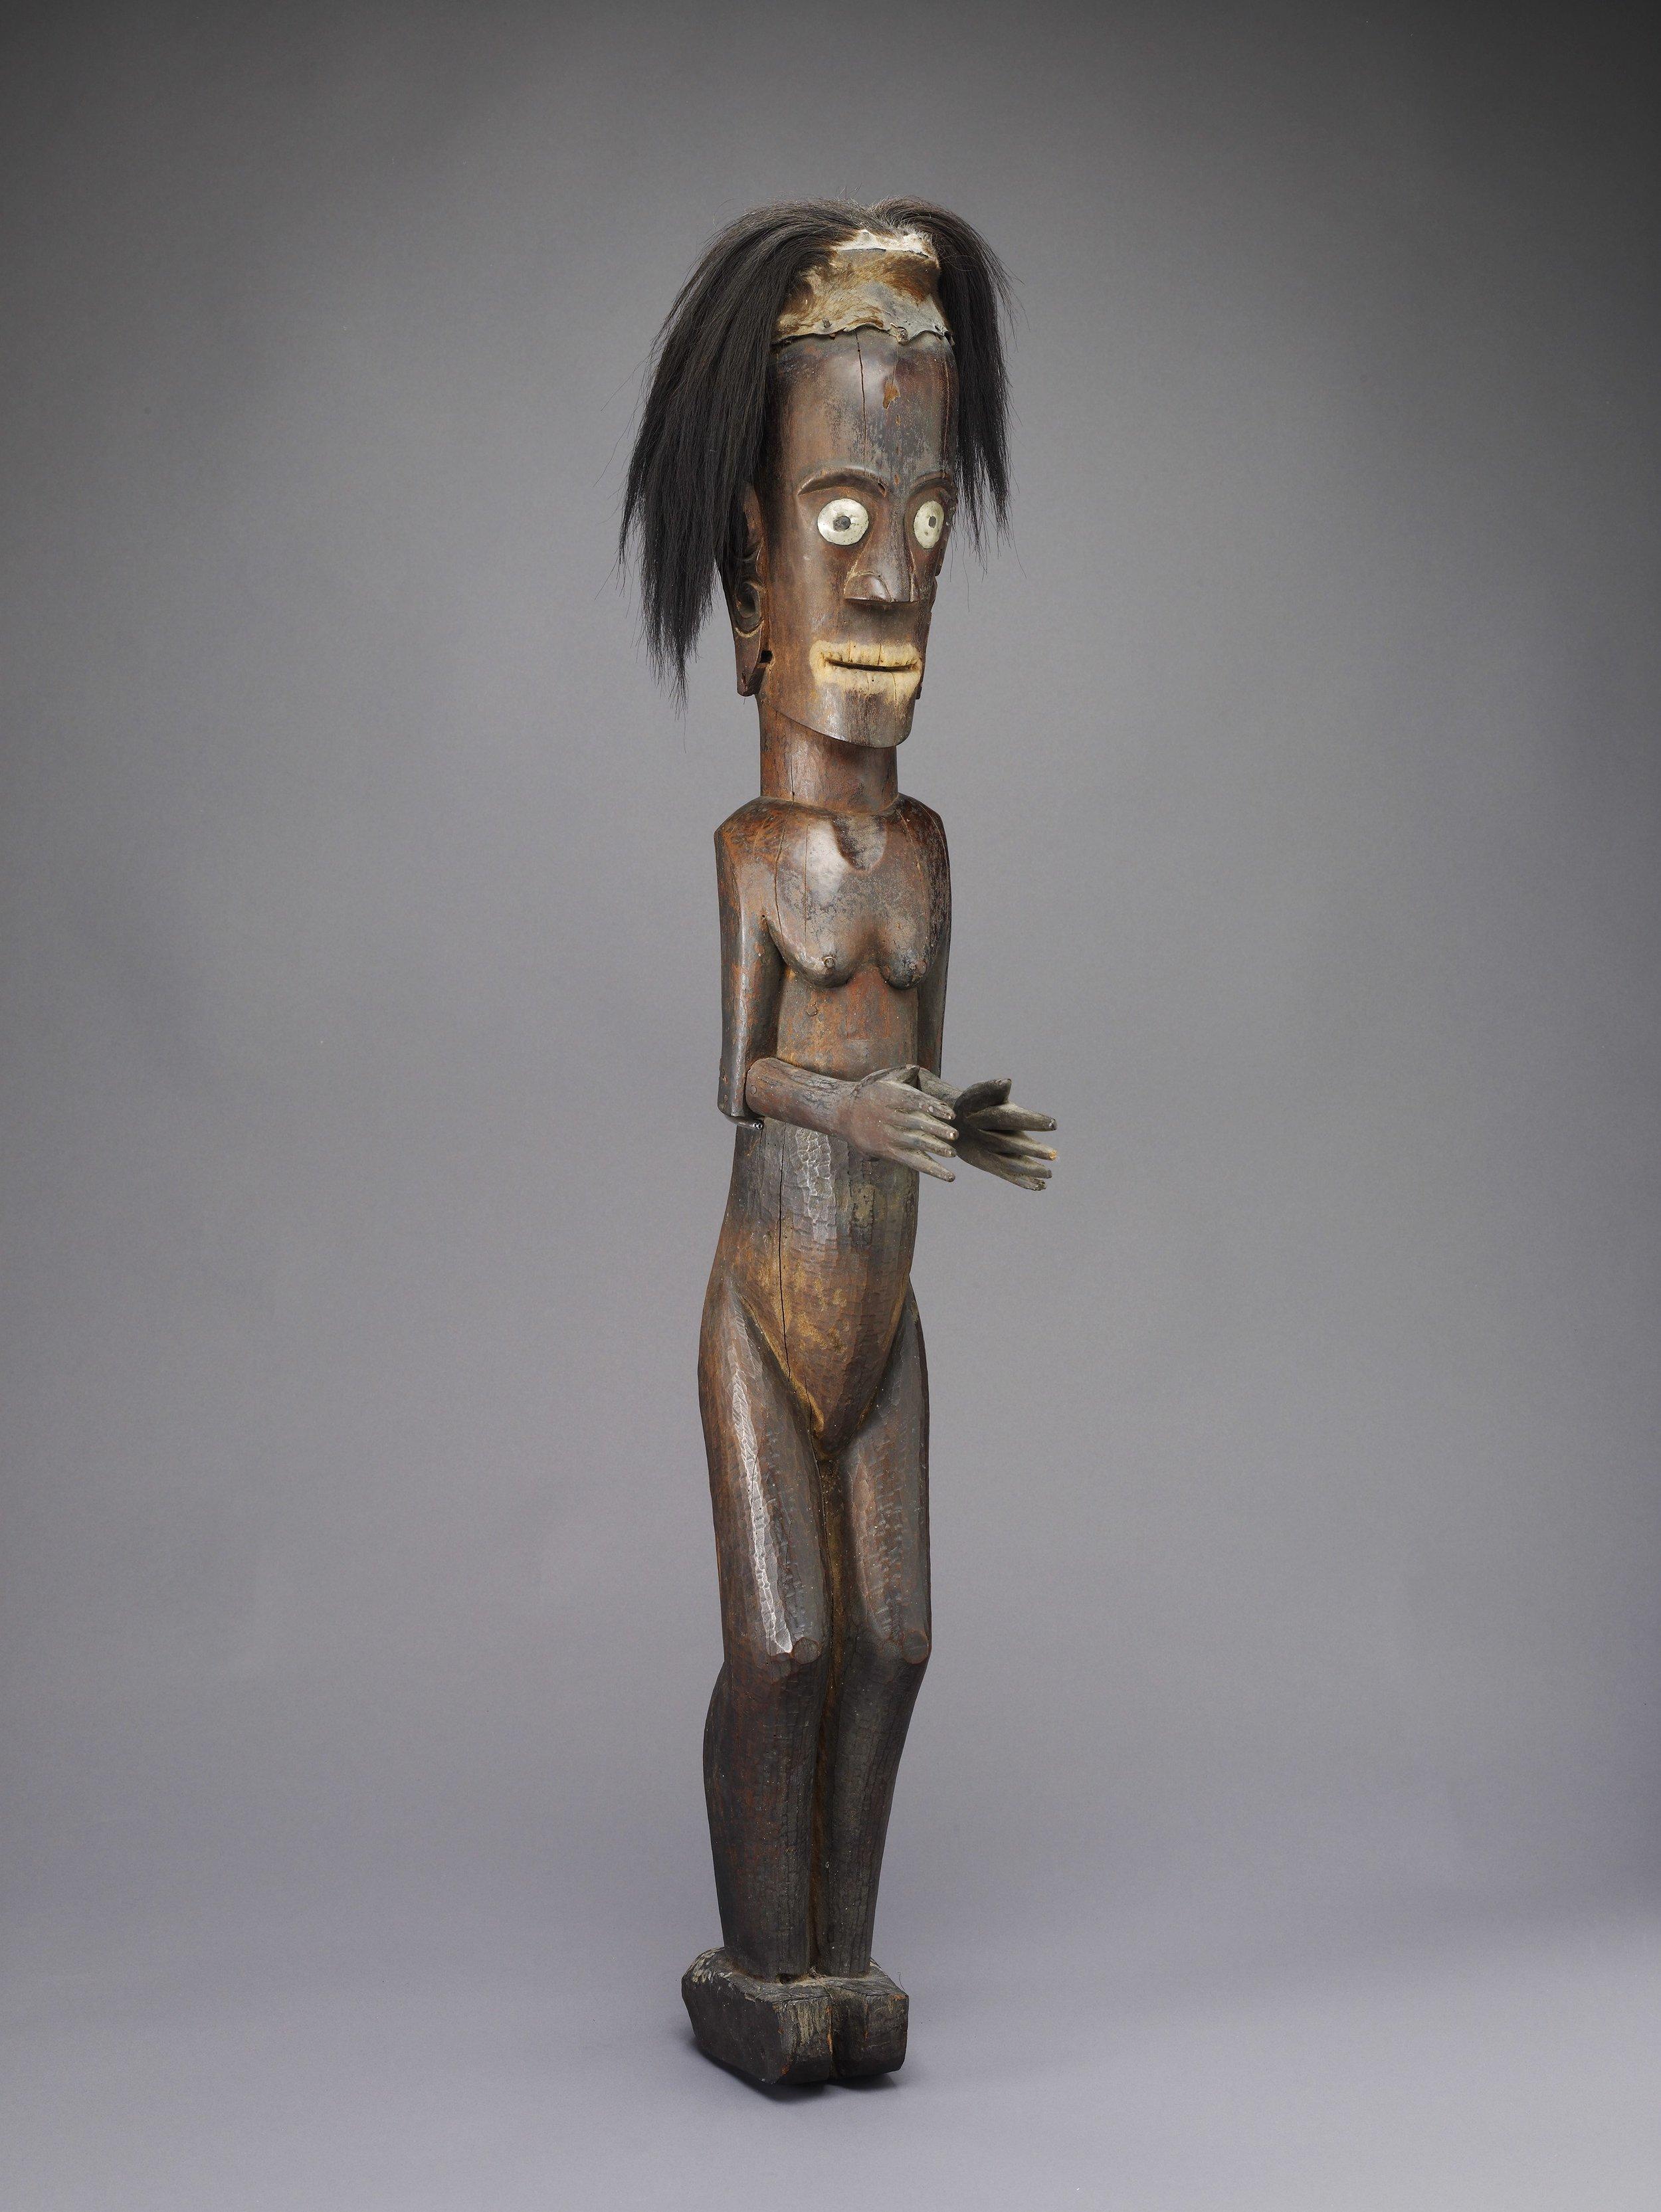 Batak Protective Statue |  Pagar  | North Sumatra © de Young | Fine Arts Museums of San Francisco